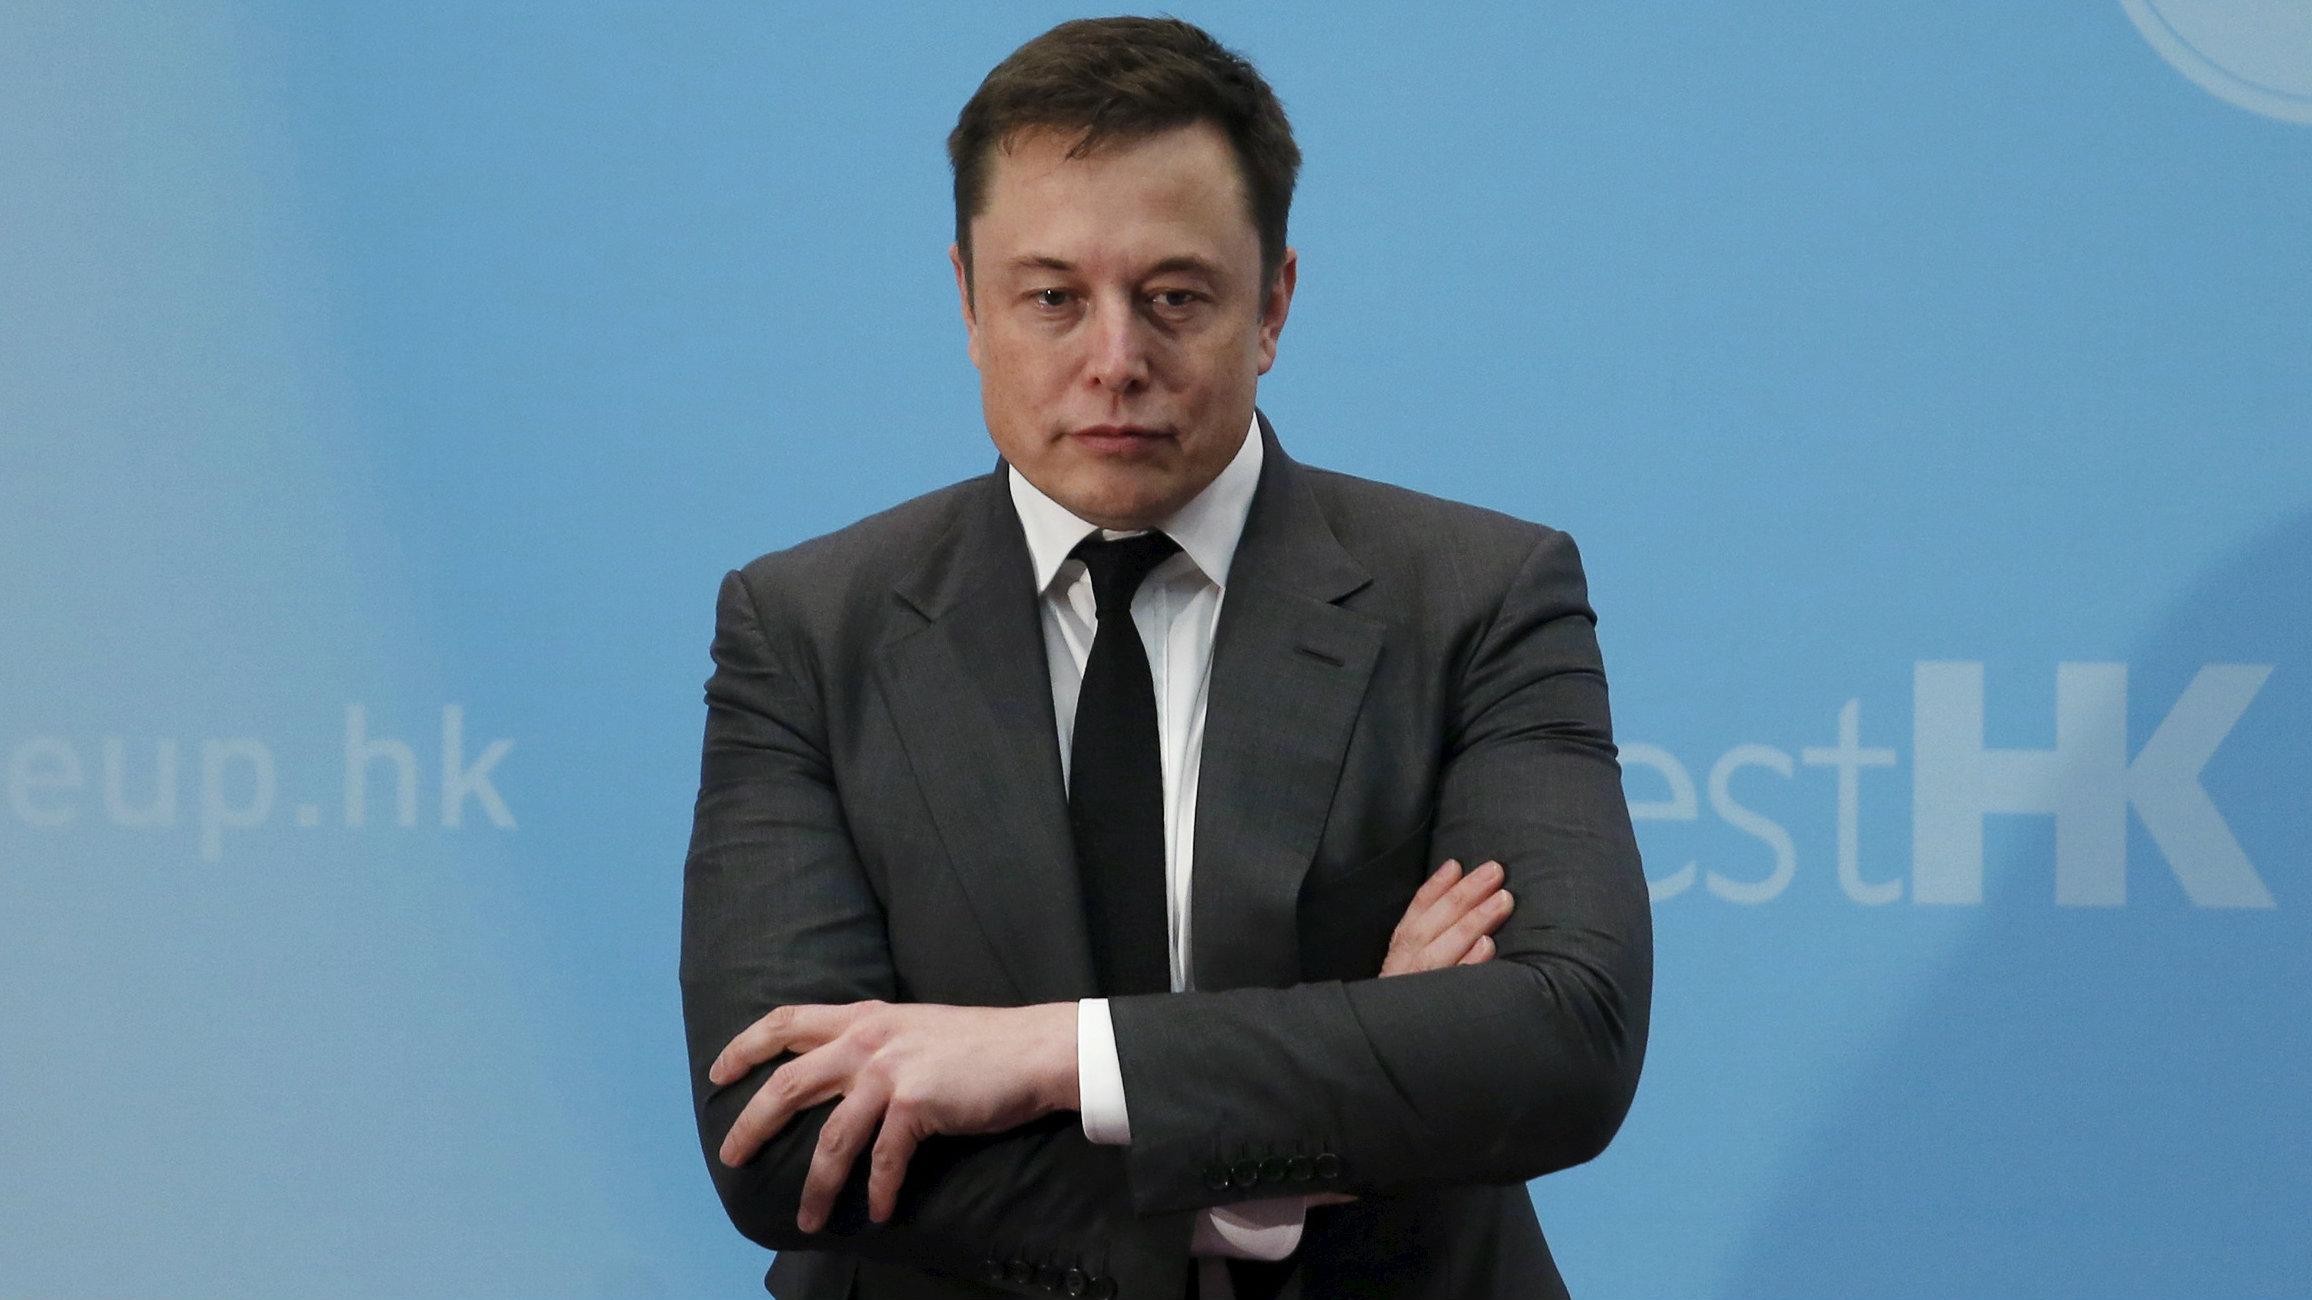 Elon Musk folding his arms